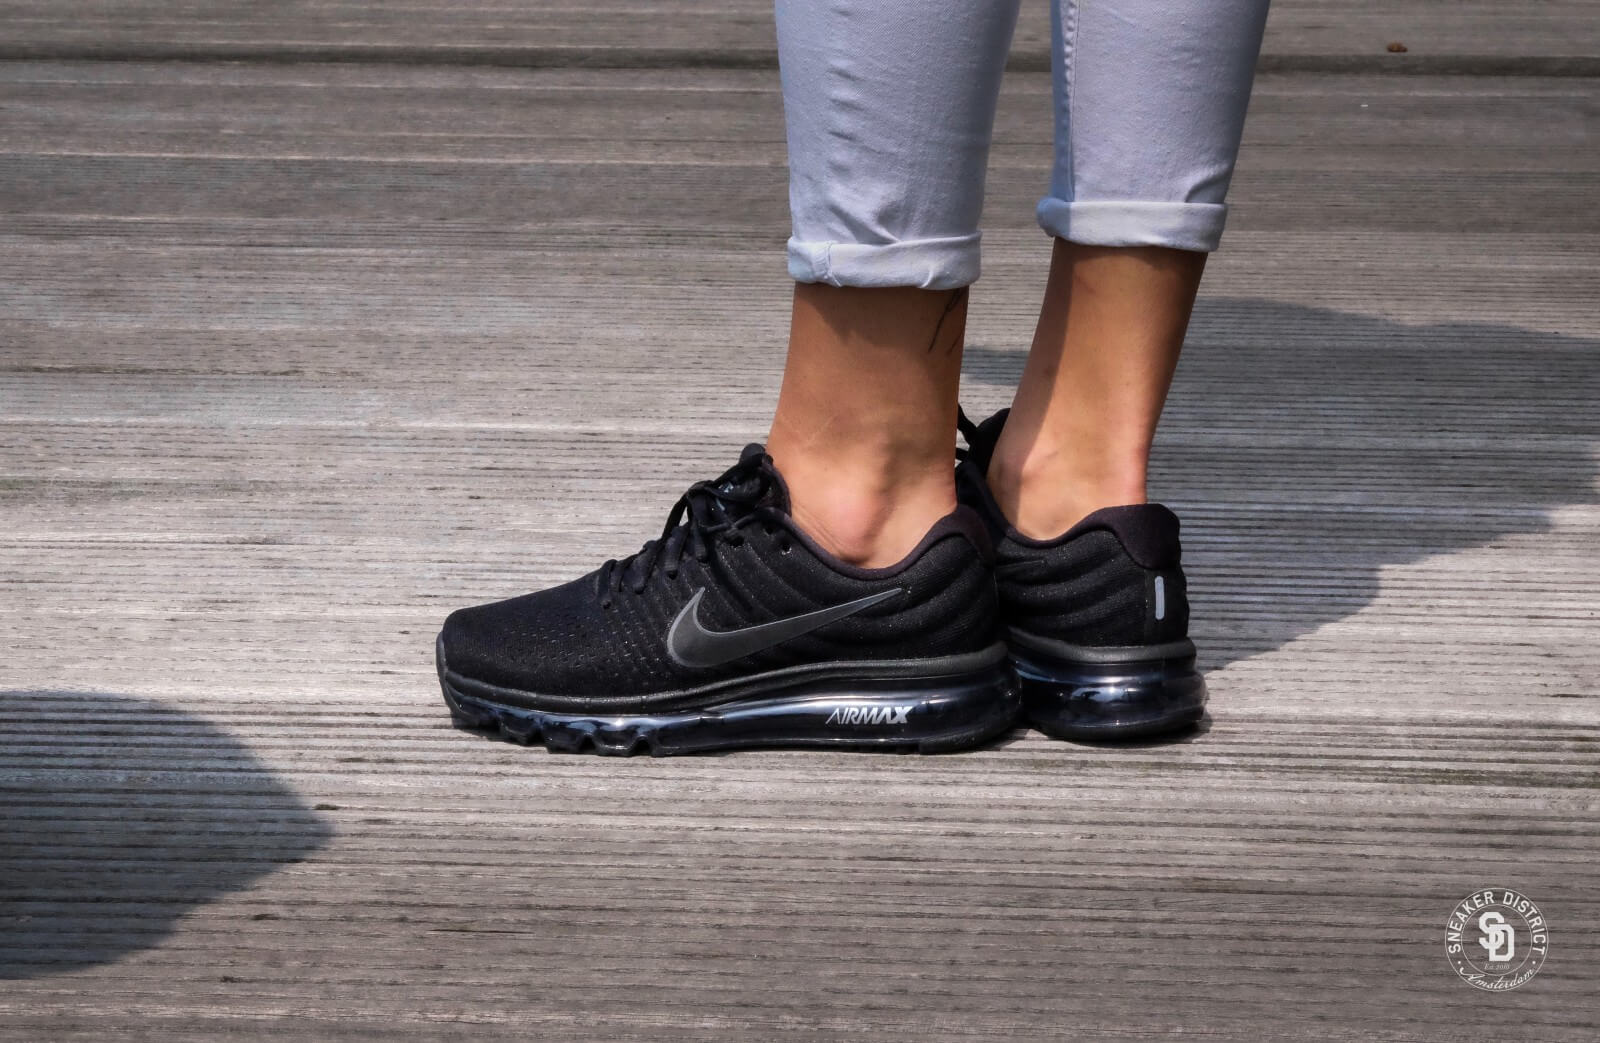 Nike Air Max 2017 GS BlackBlack 851622 004